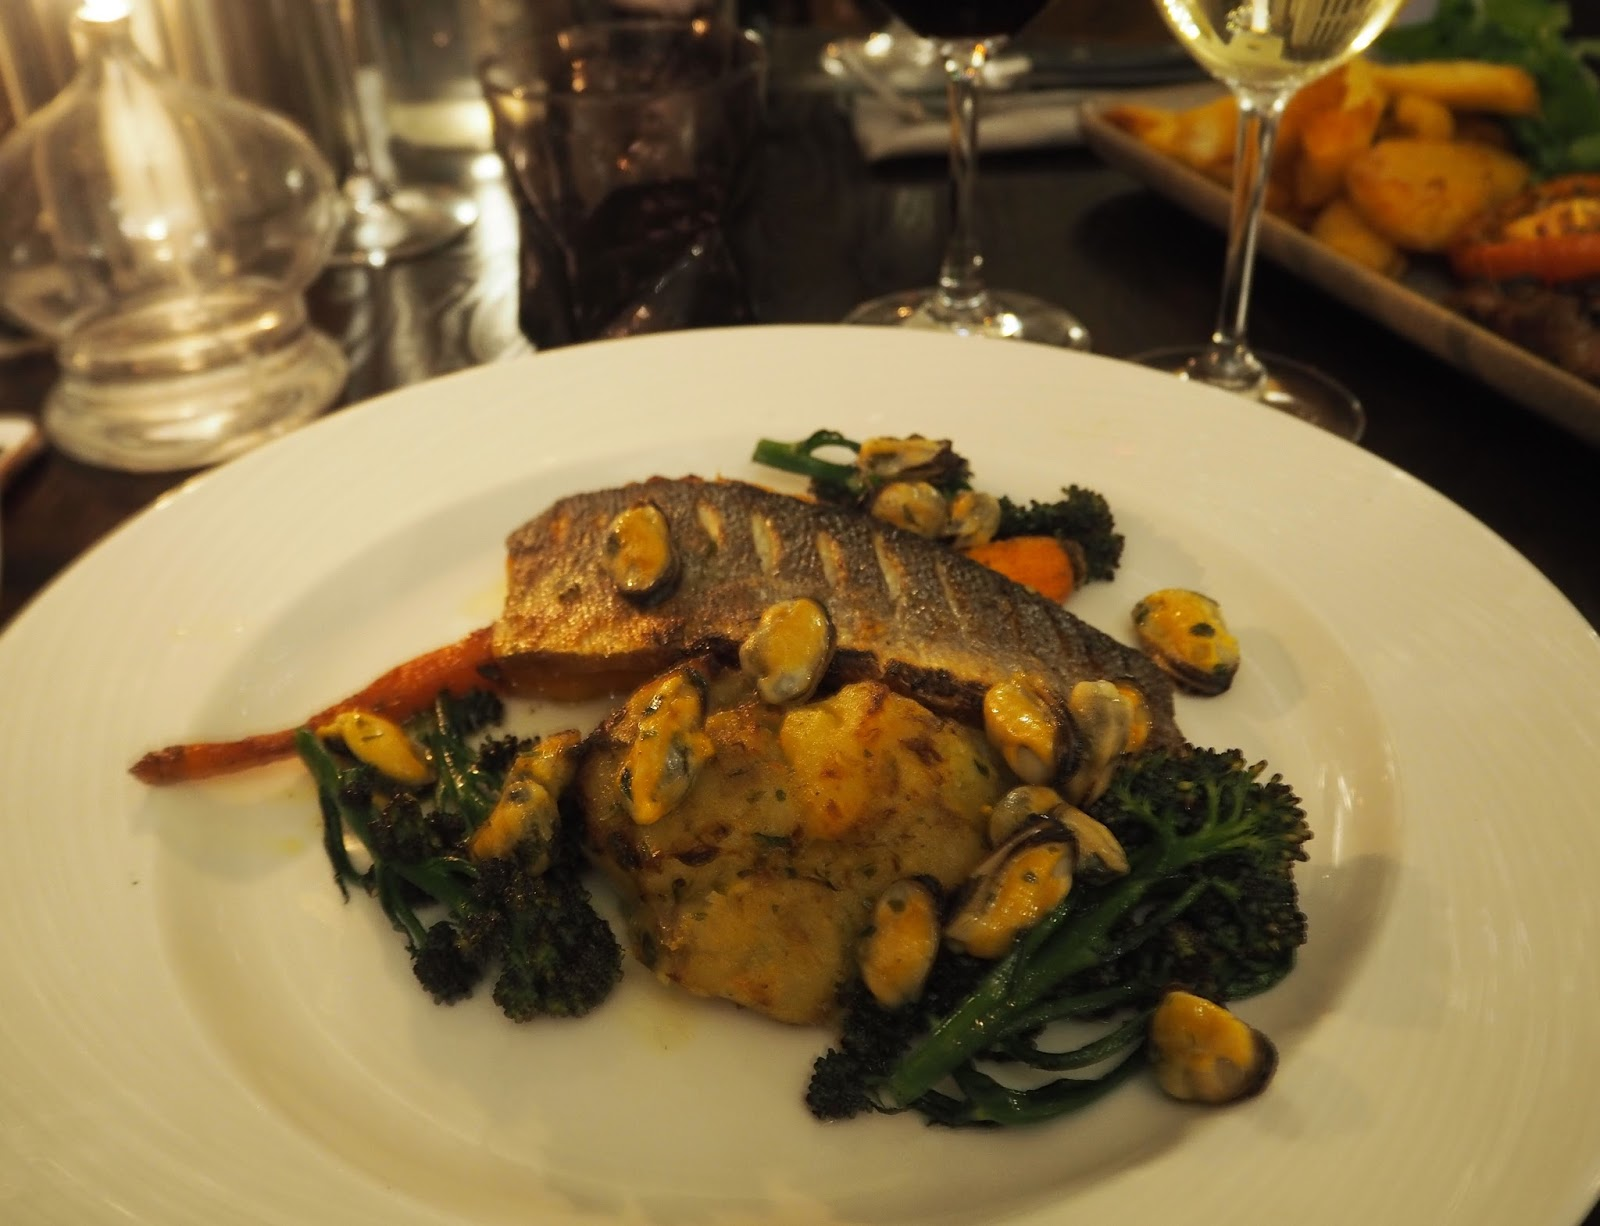 Prime restaurant, Stirk House, Gisburn, fish main course